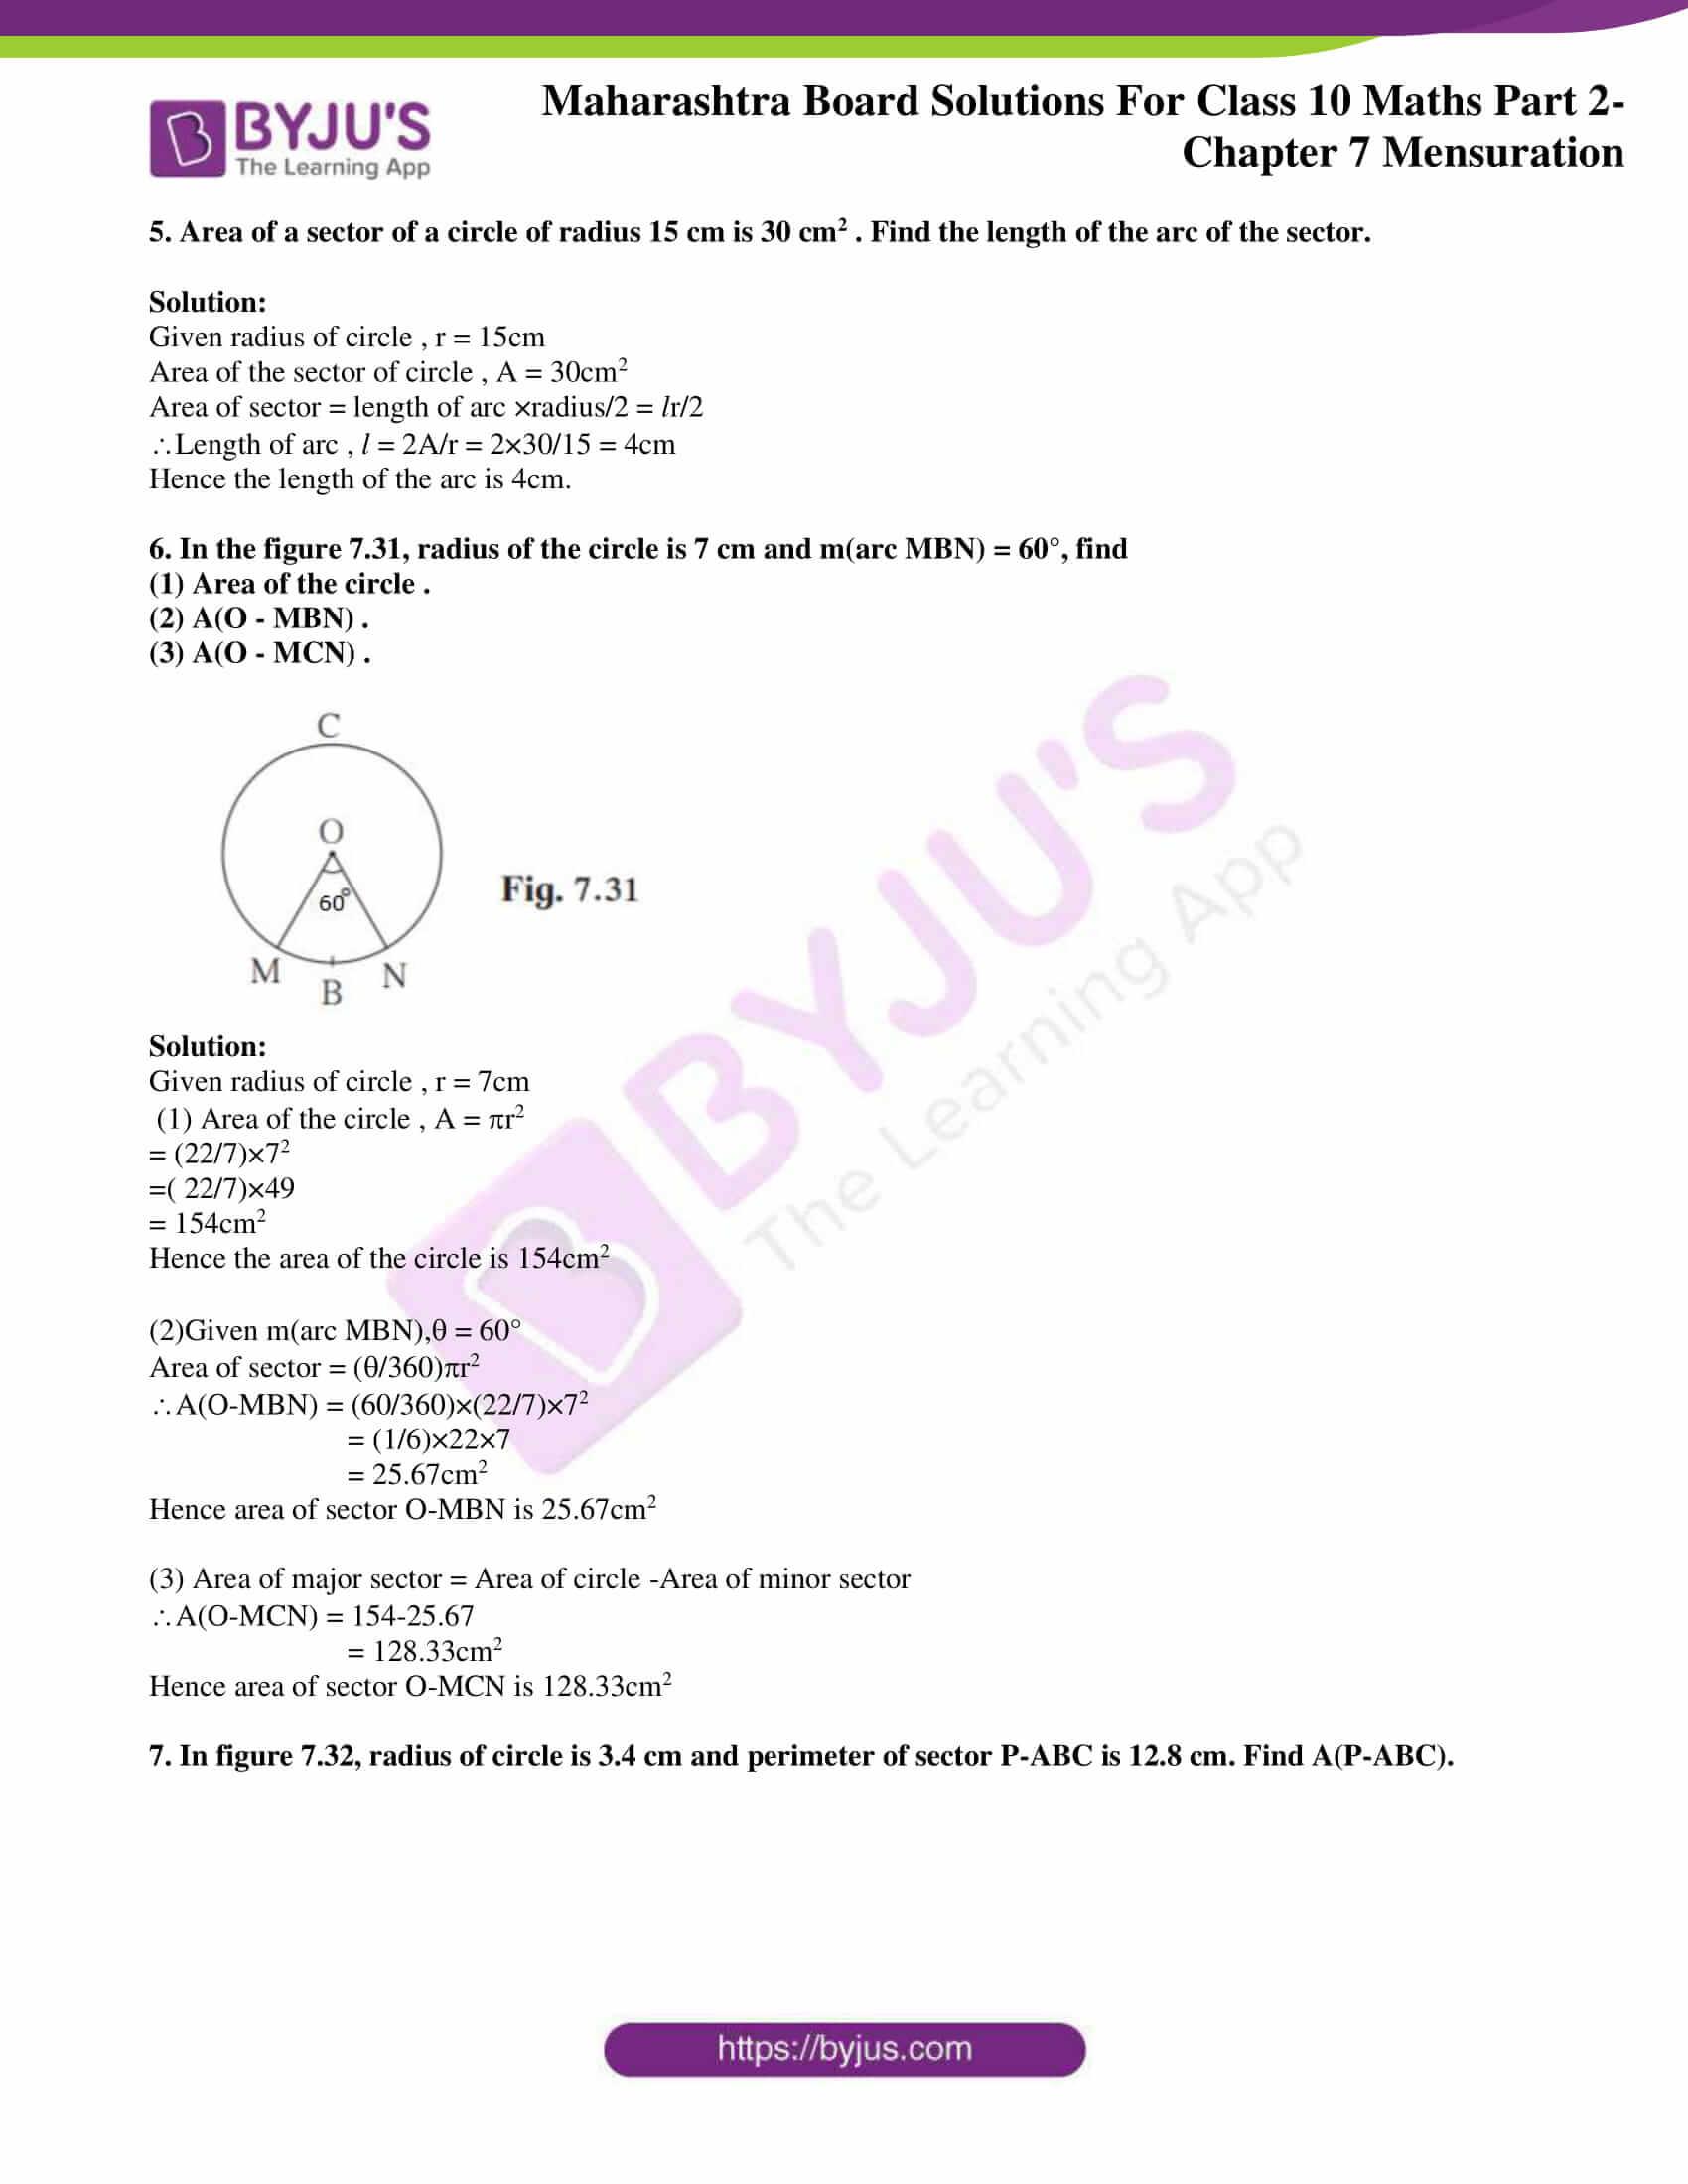 msbshse sol class 10 maths part 2 chapter 7 12